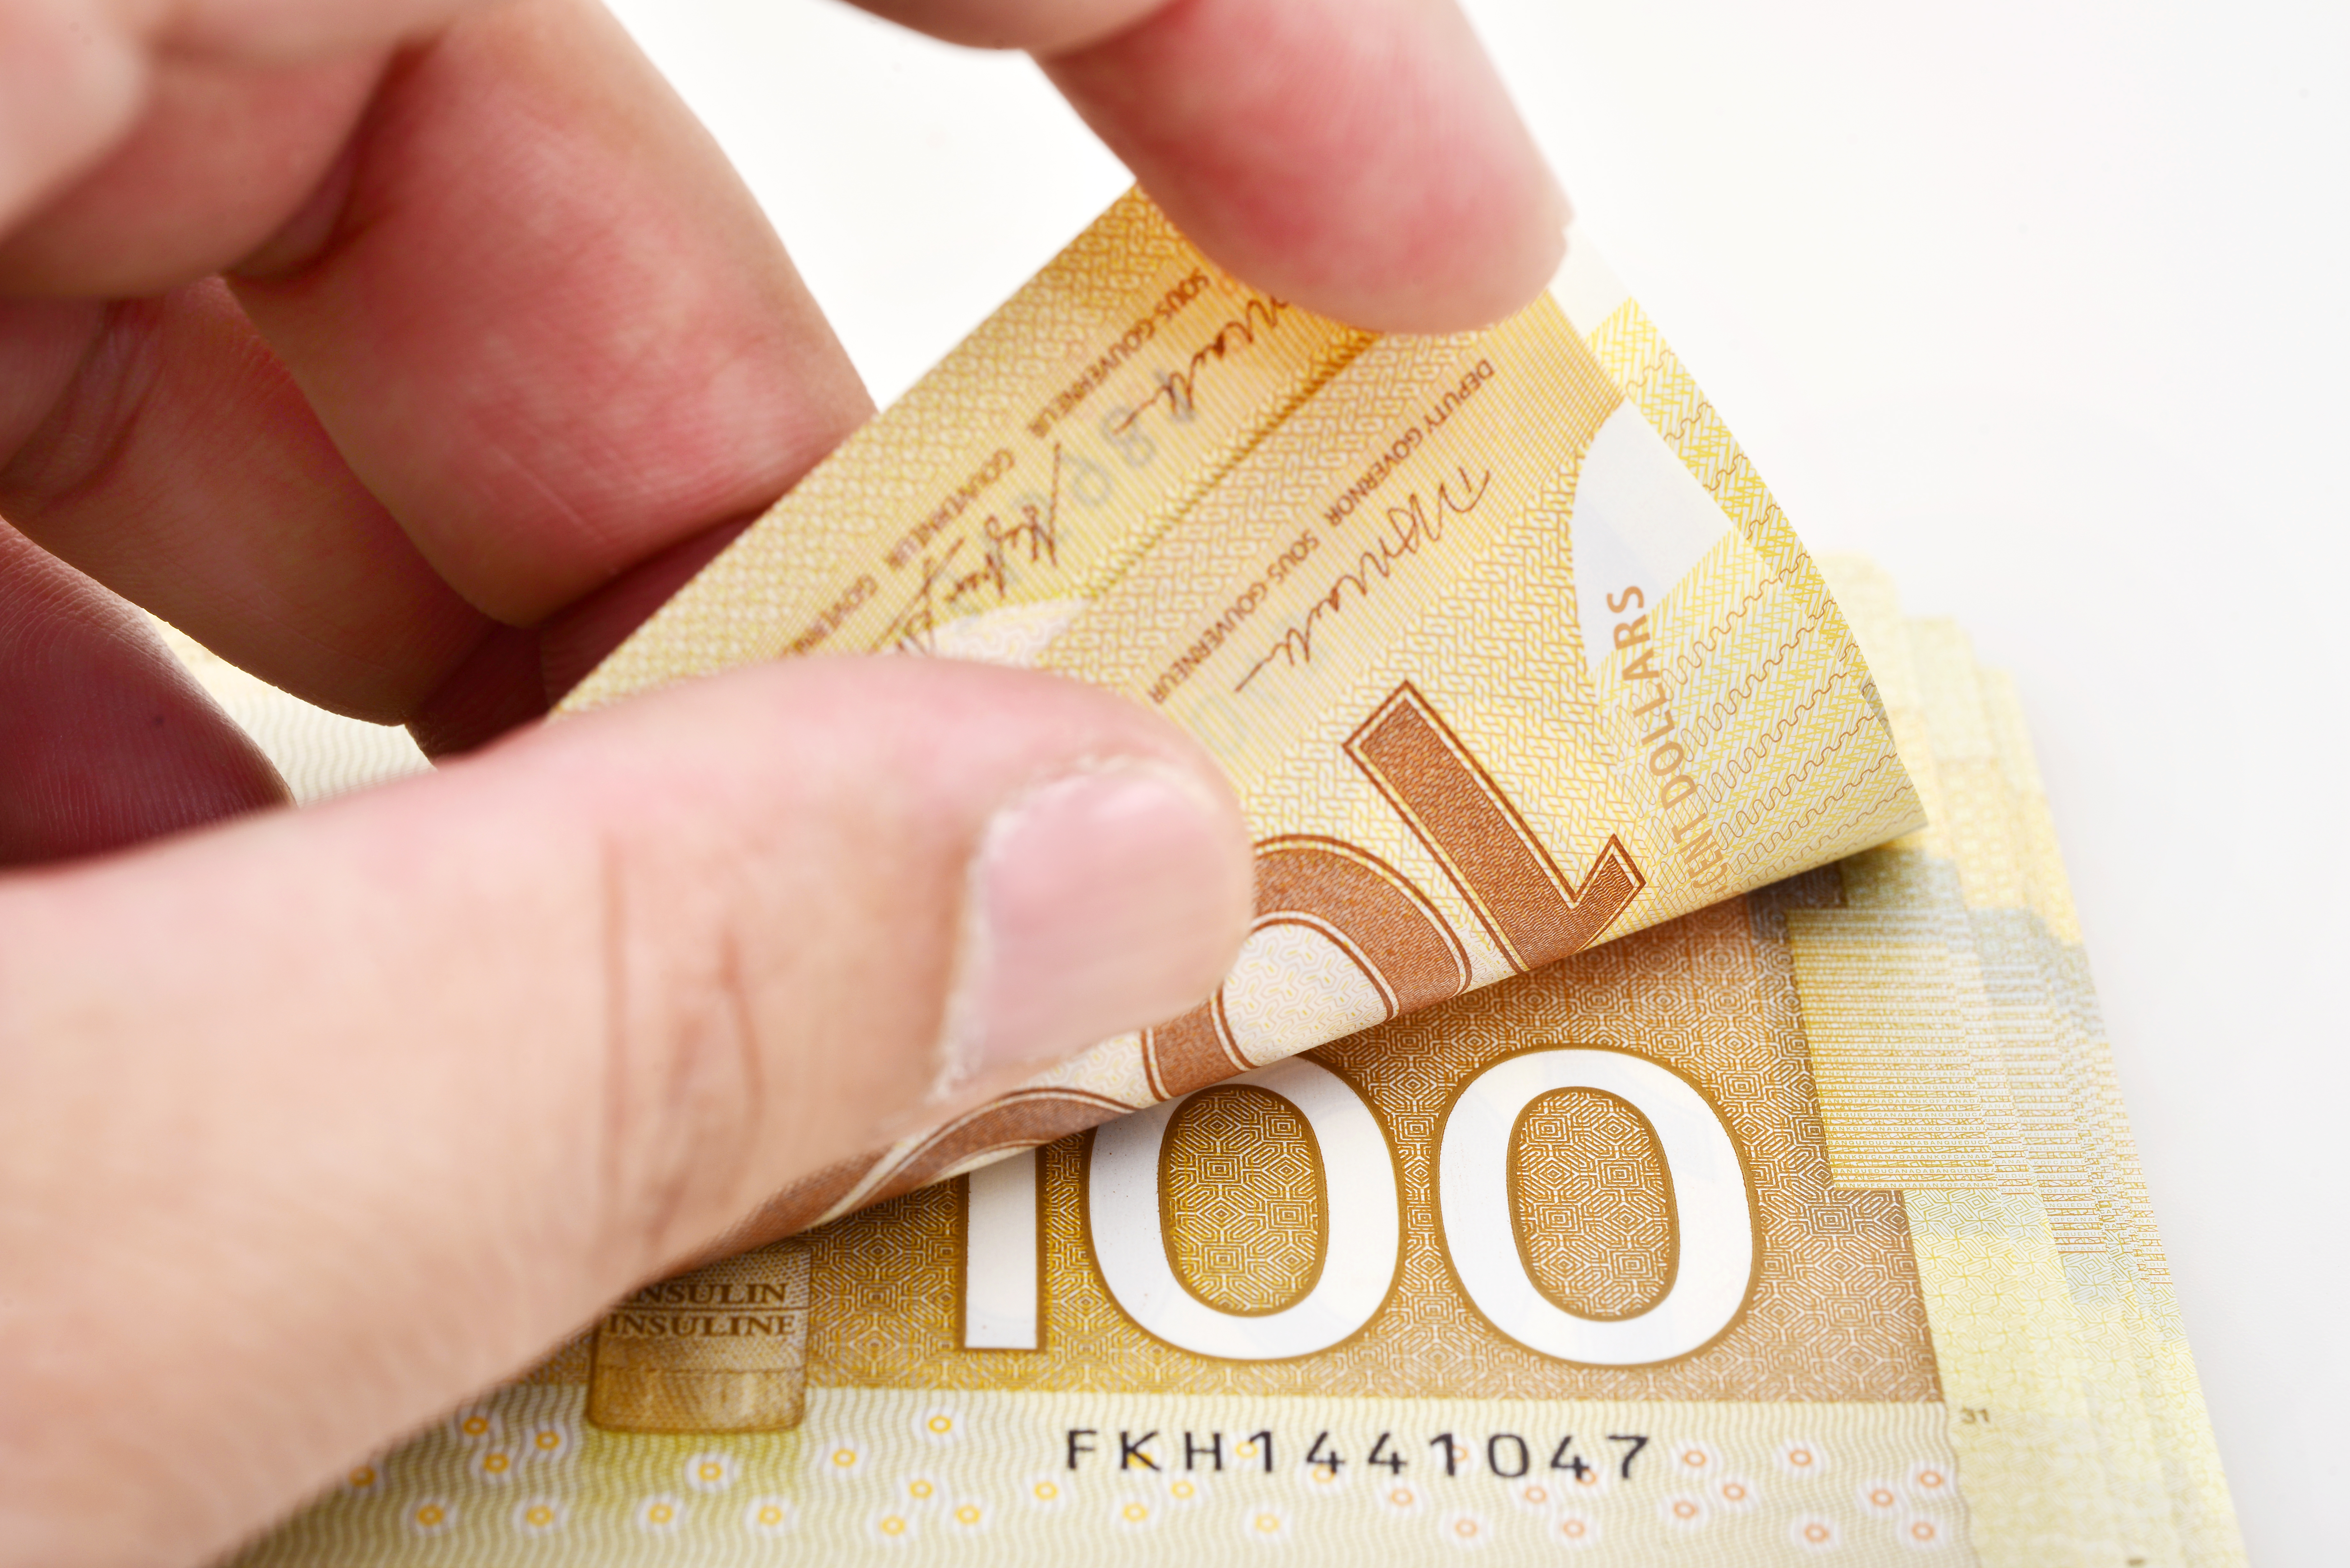 Canadian Bioceutical reports revenue up 14%